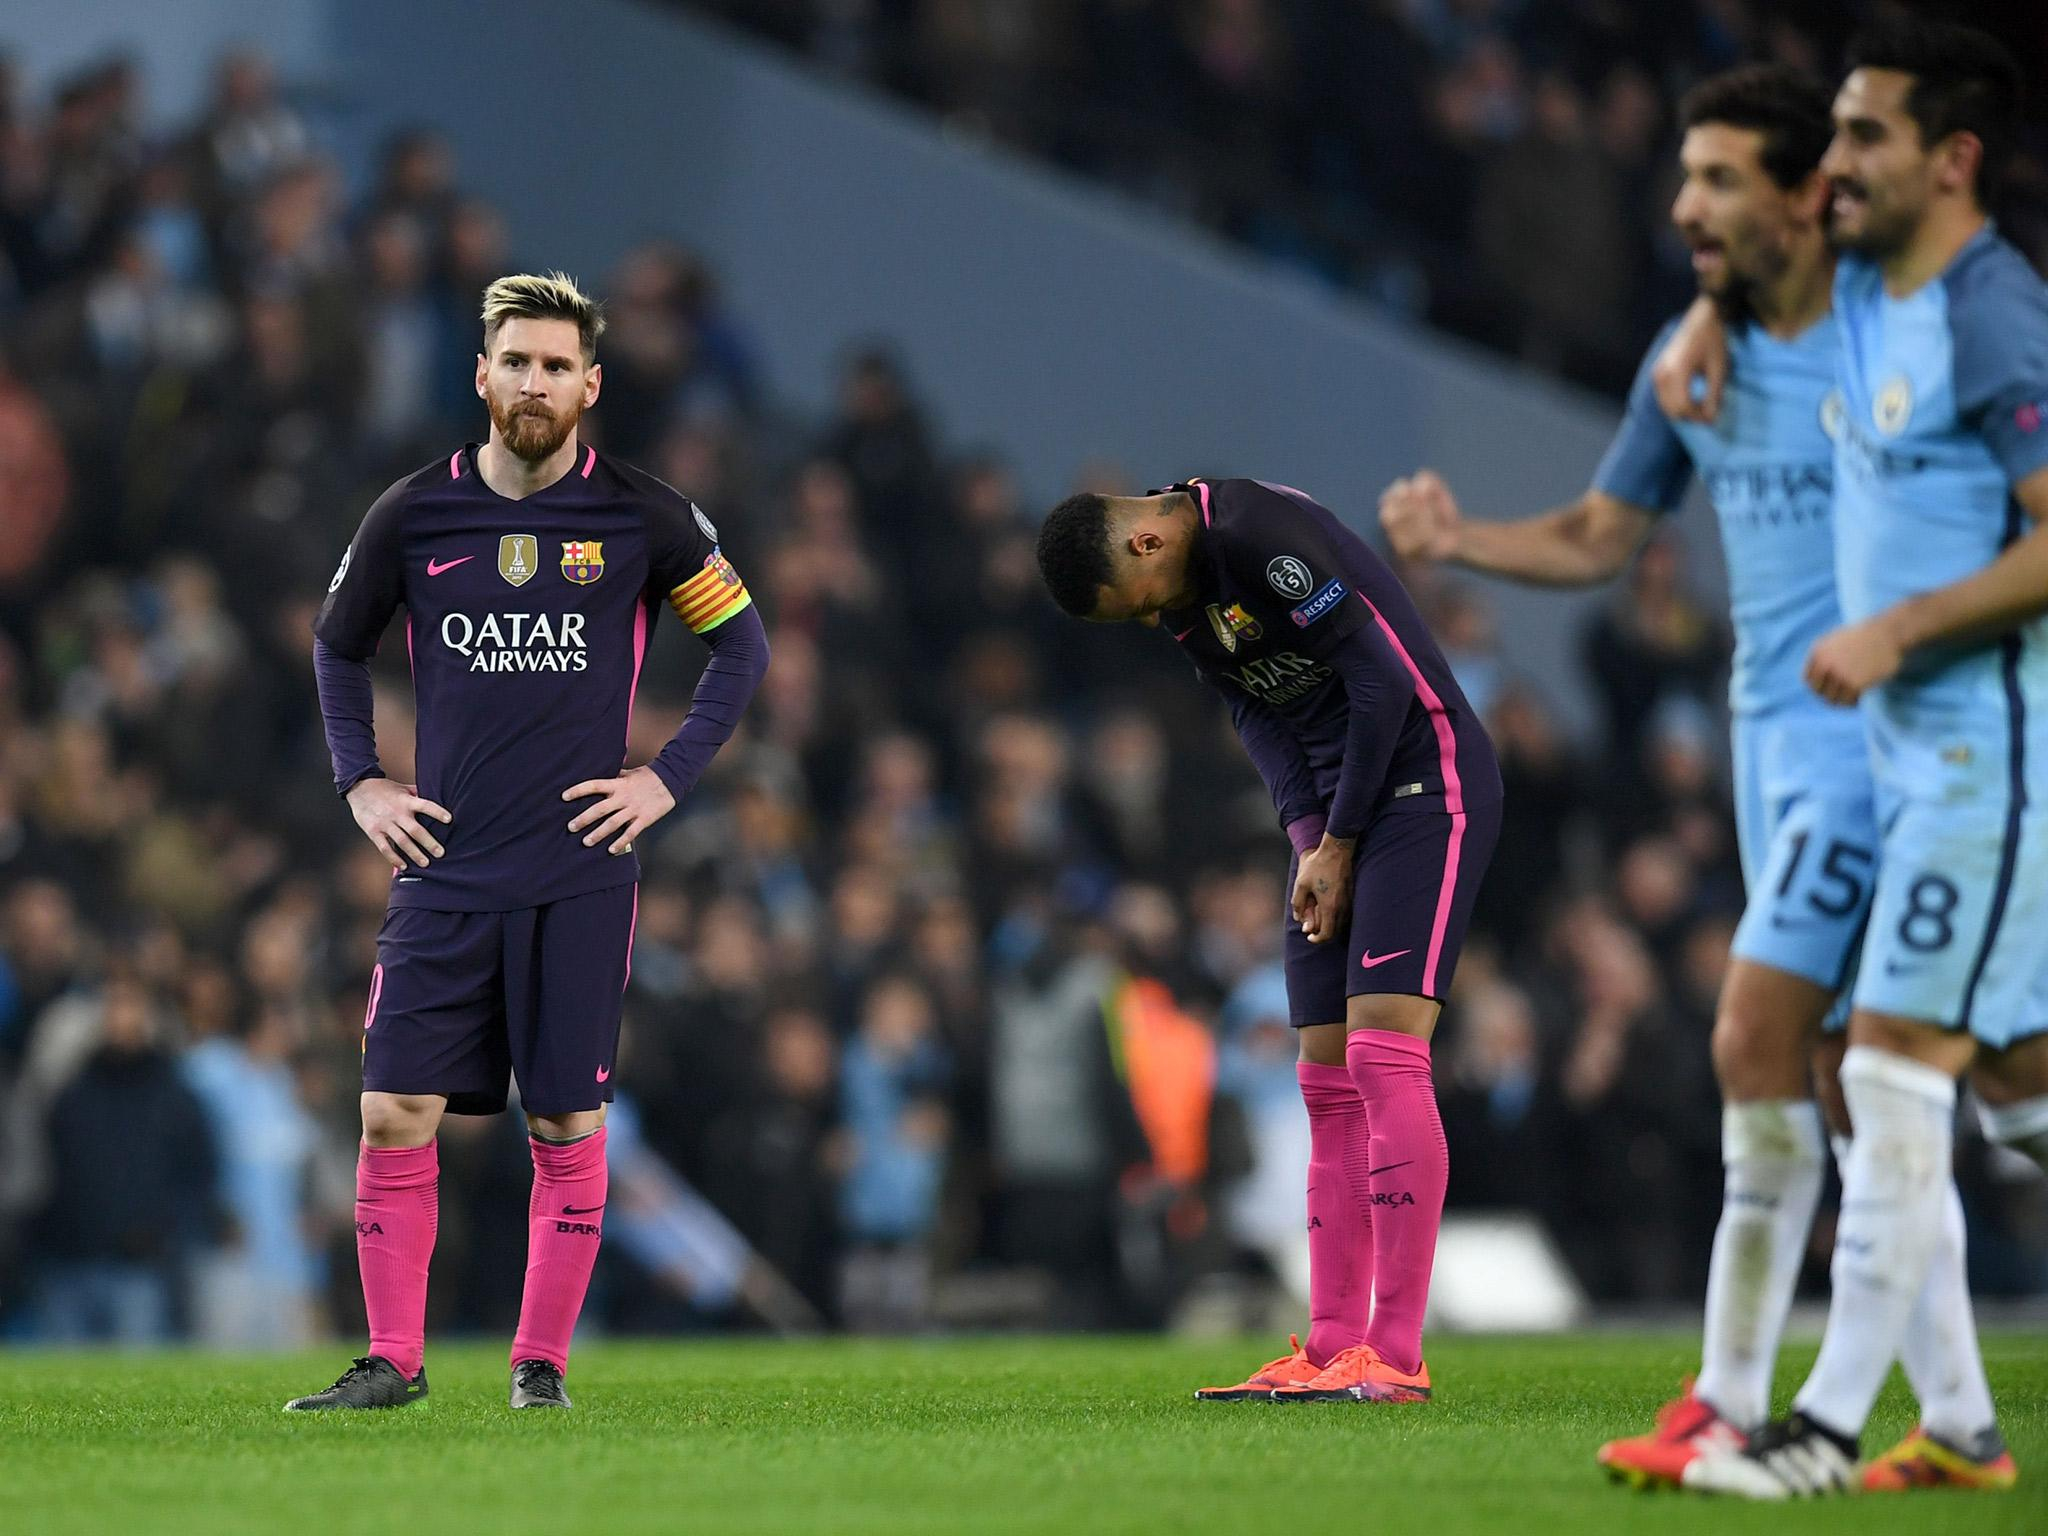 Barcelona Vs Man City Logo: Manchester City Vs Barcelona: Sergio Aguero 'heard